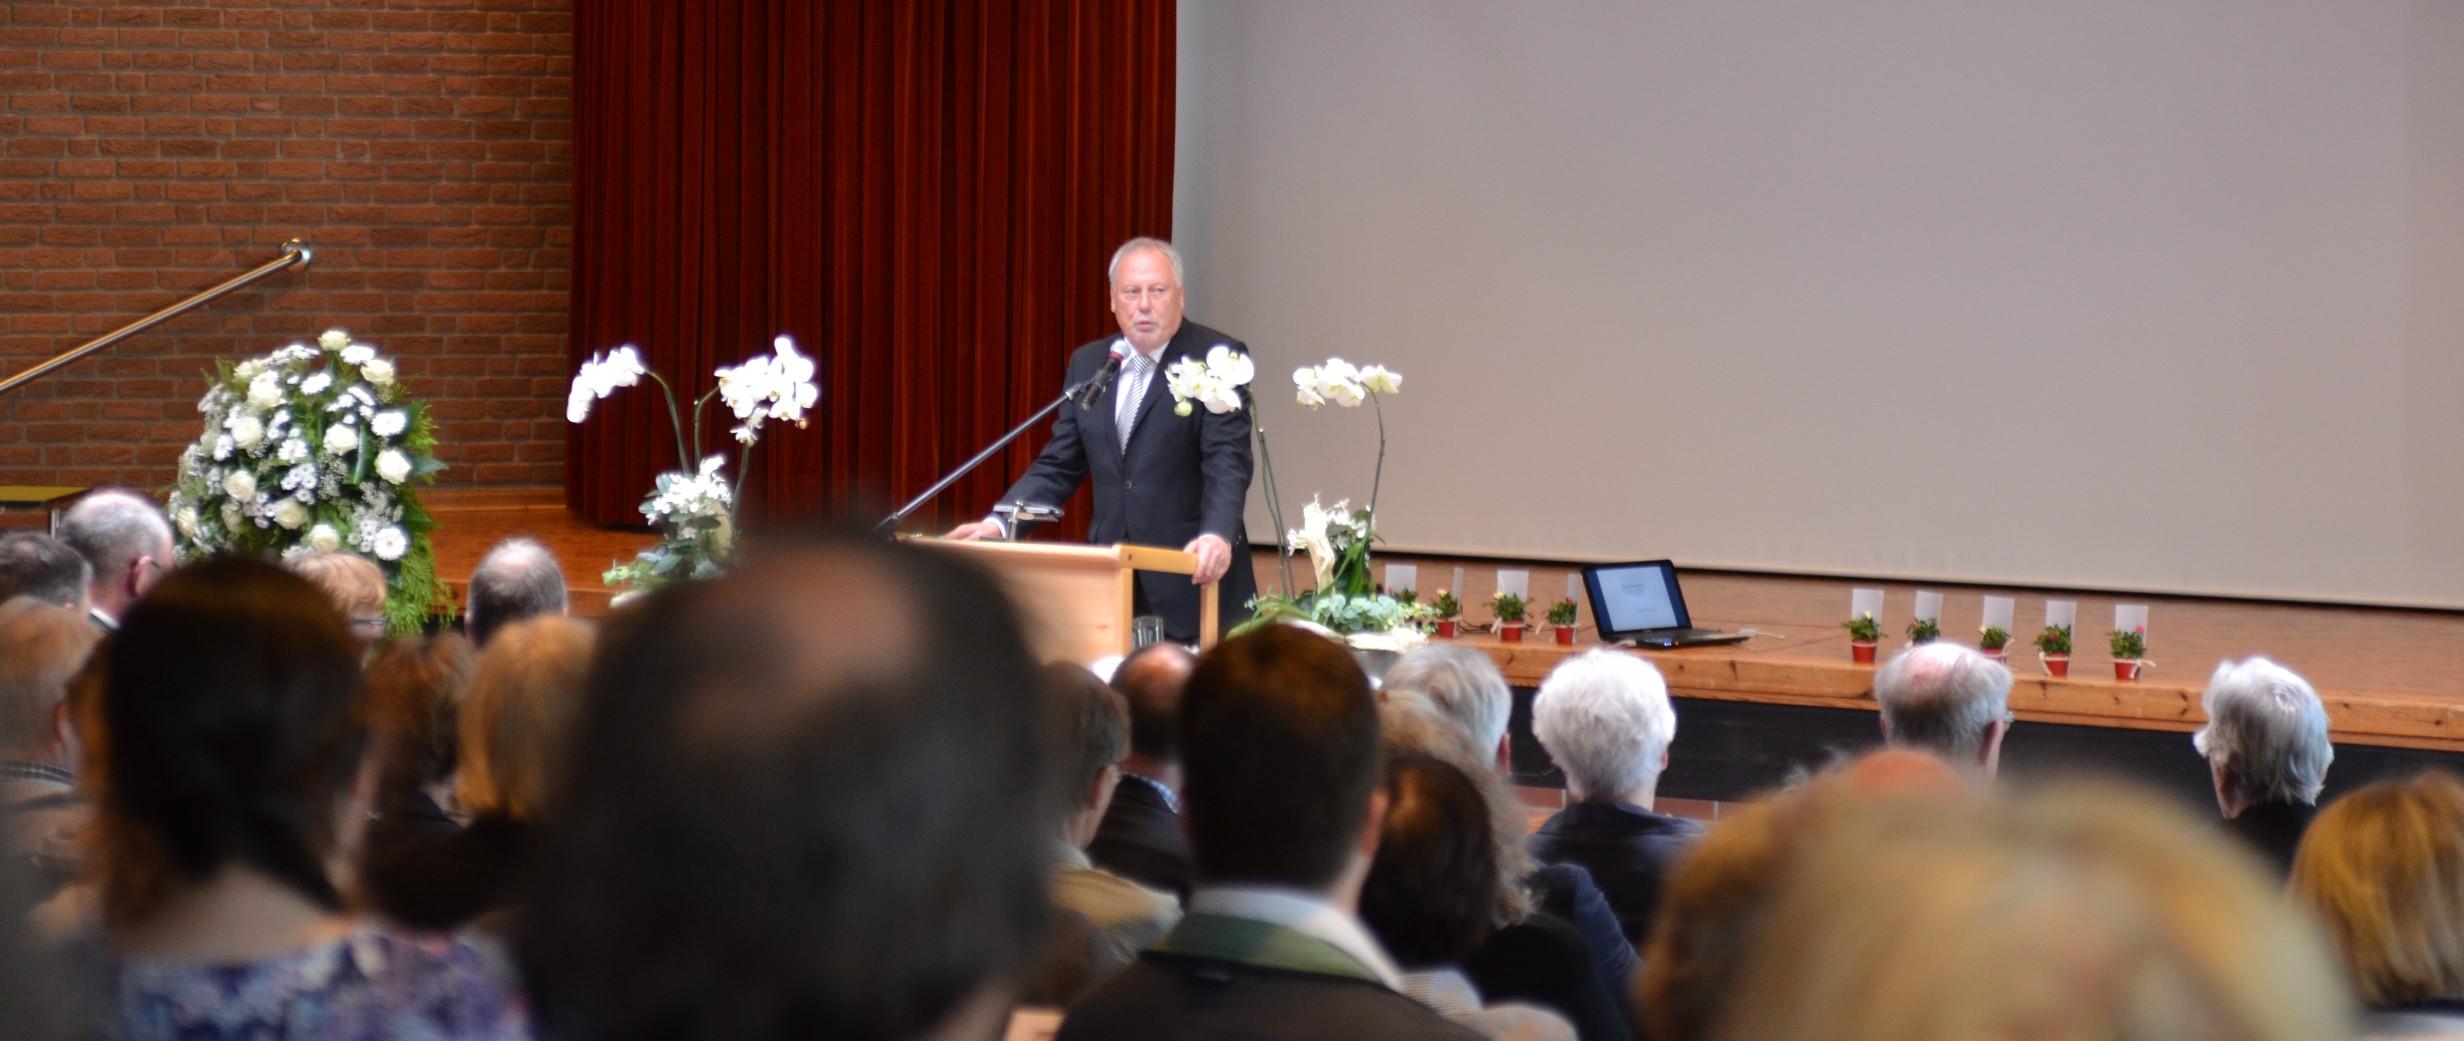 Begrüßung von Stephan Böhme